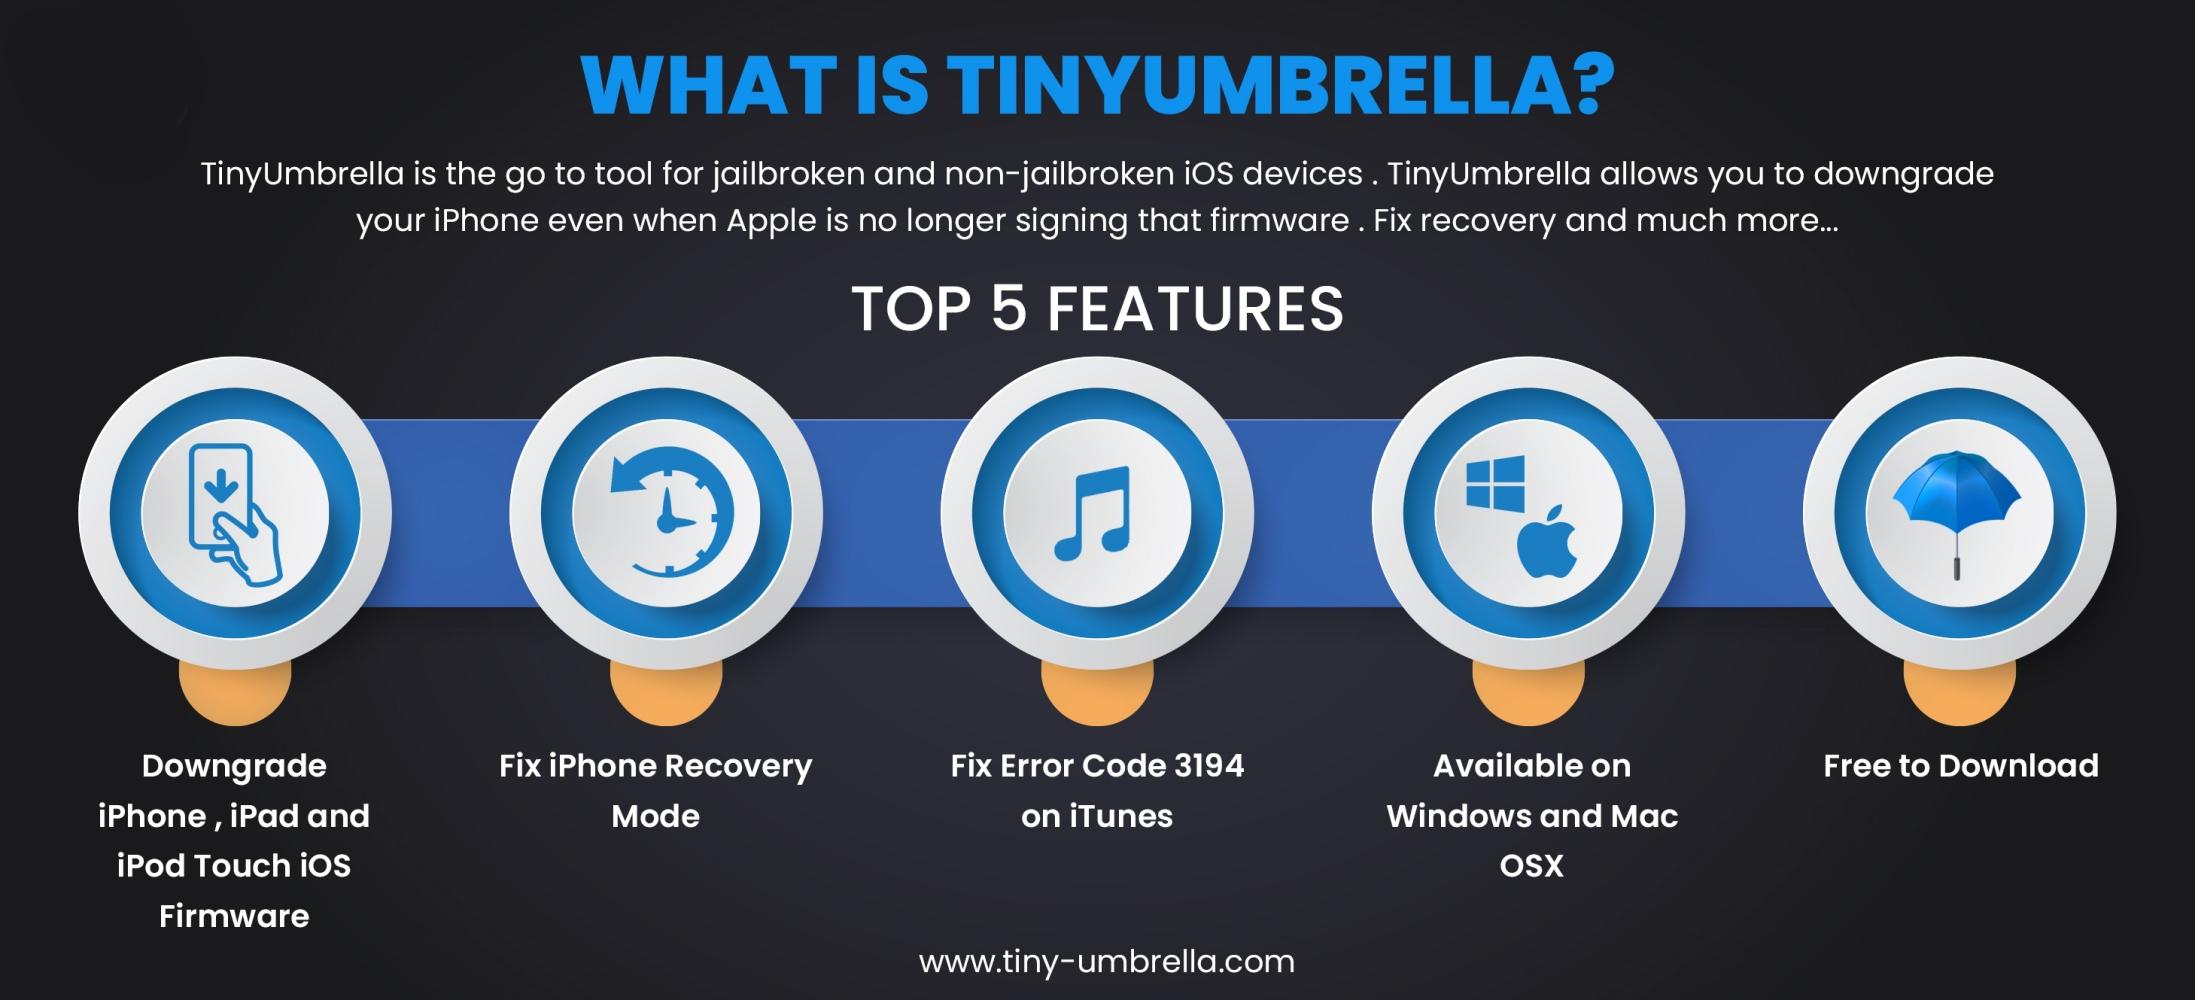 TinyUmbrella App Fixes iPhone Recovery Mode